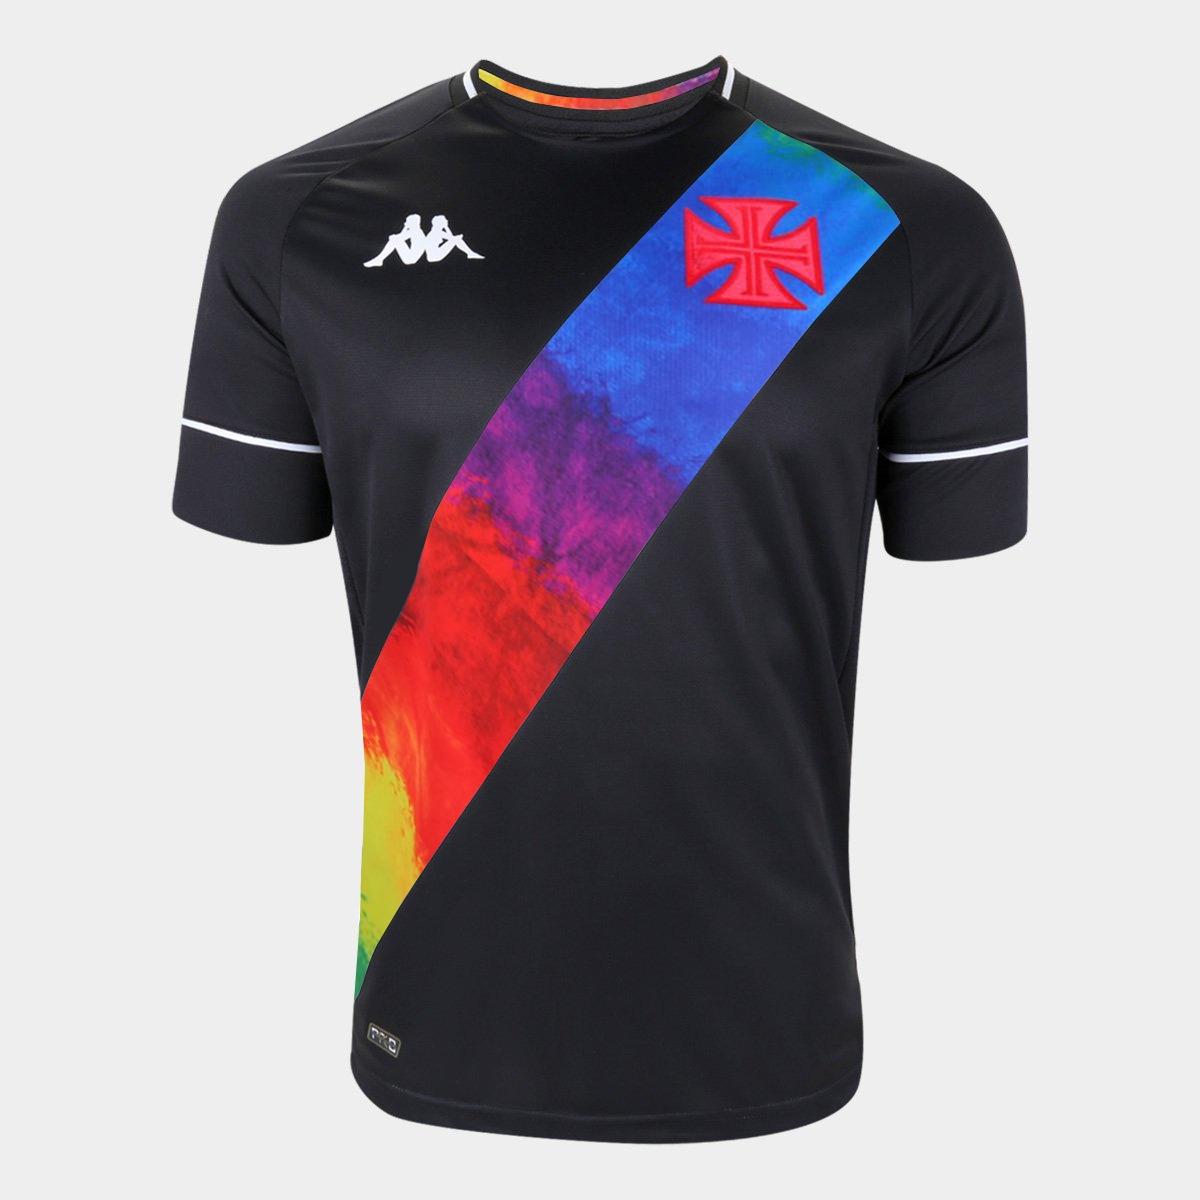 PRÉ-VENDA - Camisa Orgulho LGBTQIA+ Preta Plus Size- Kappa